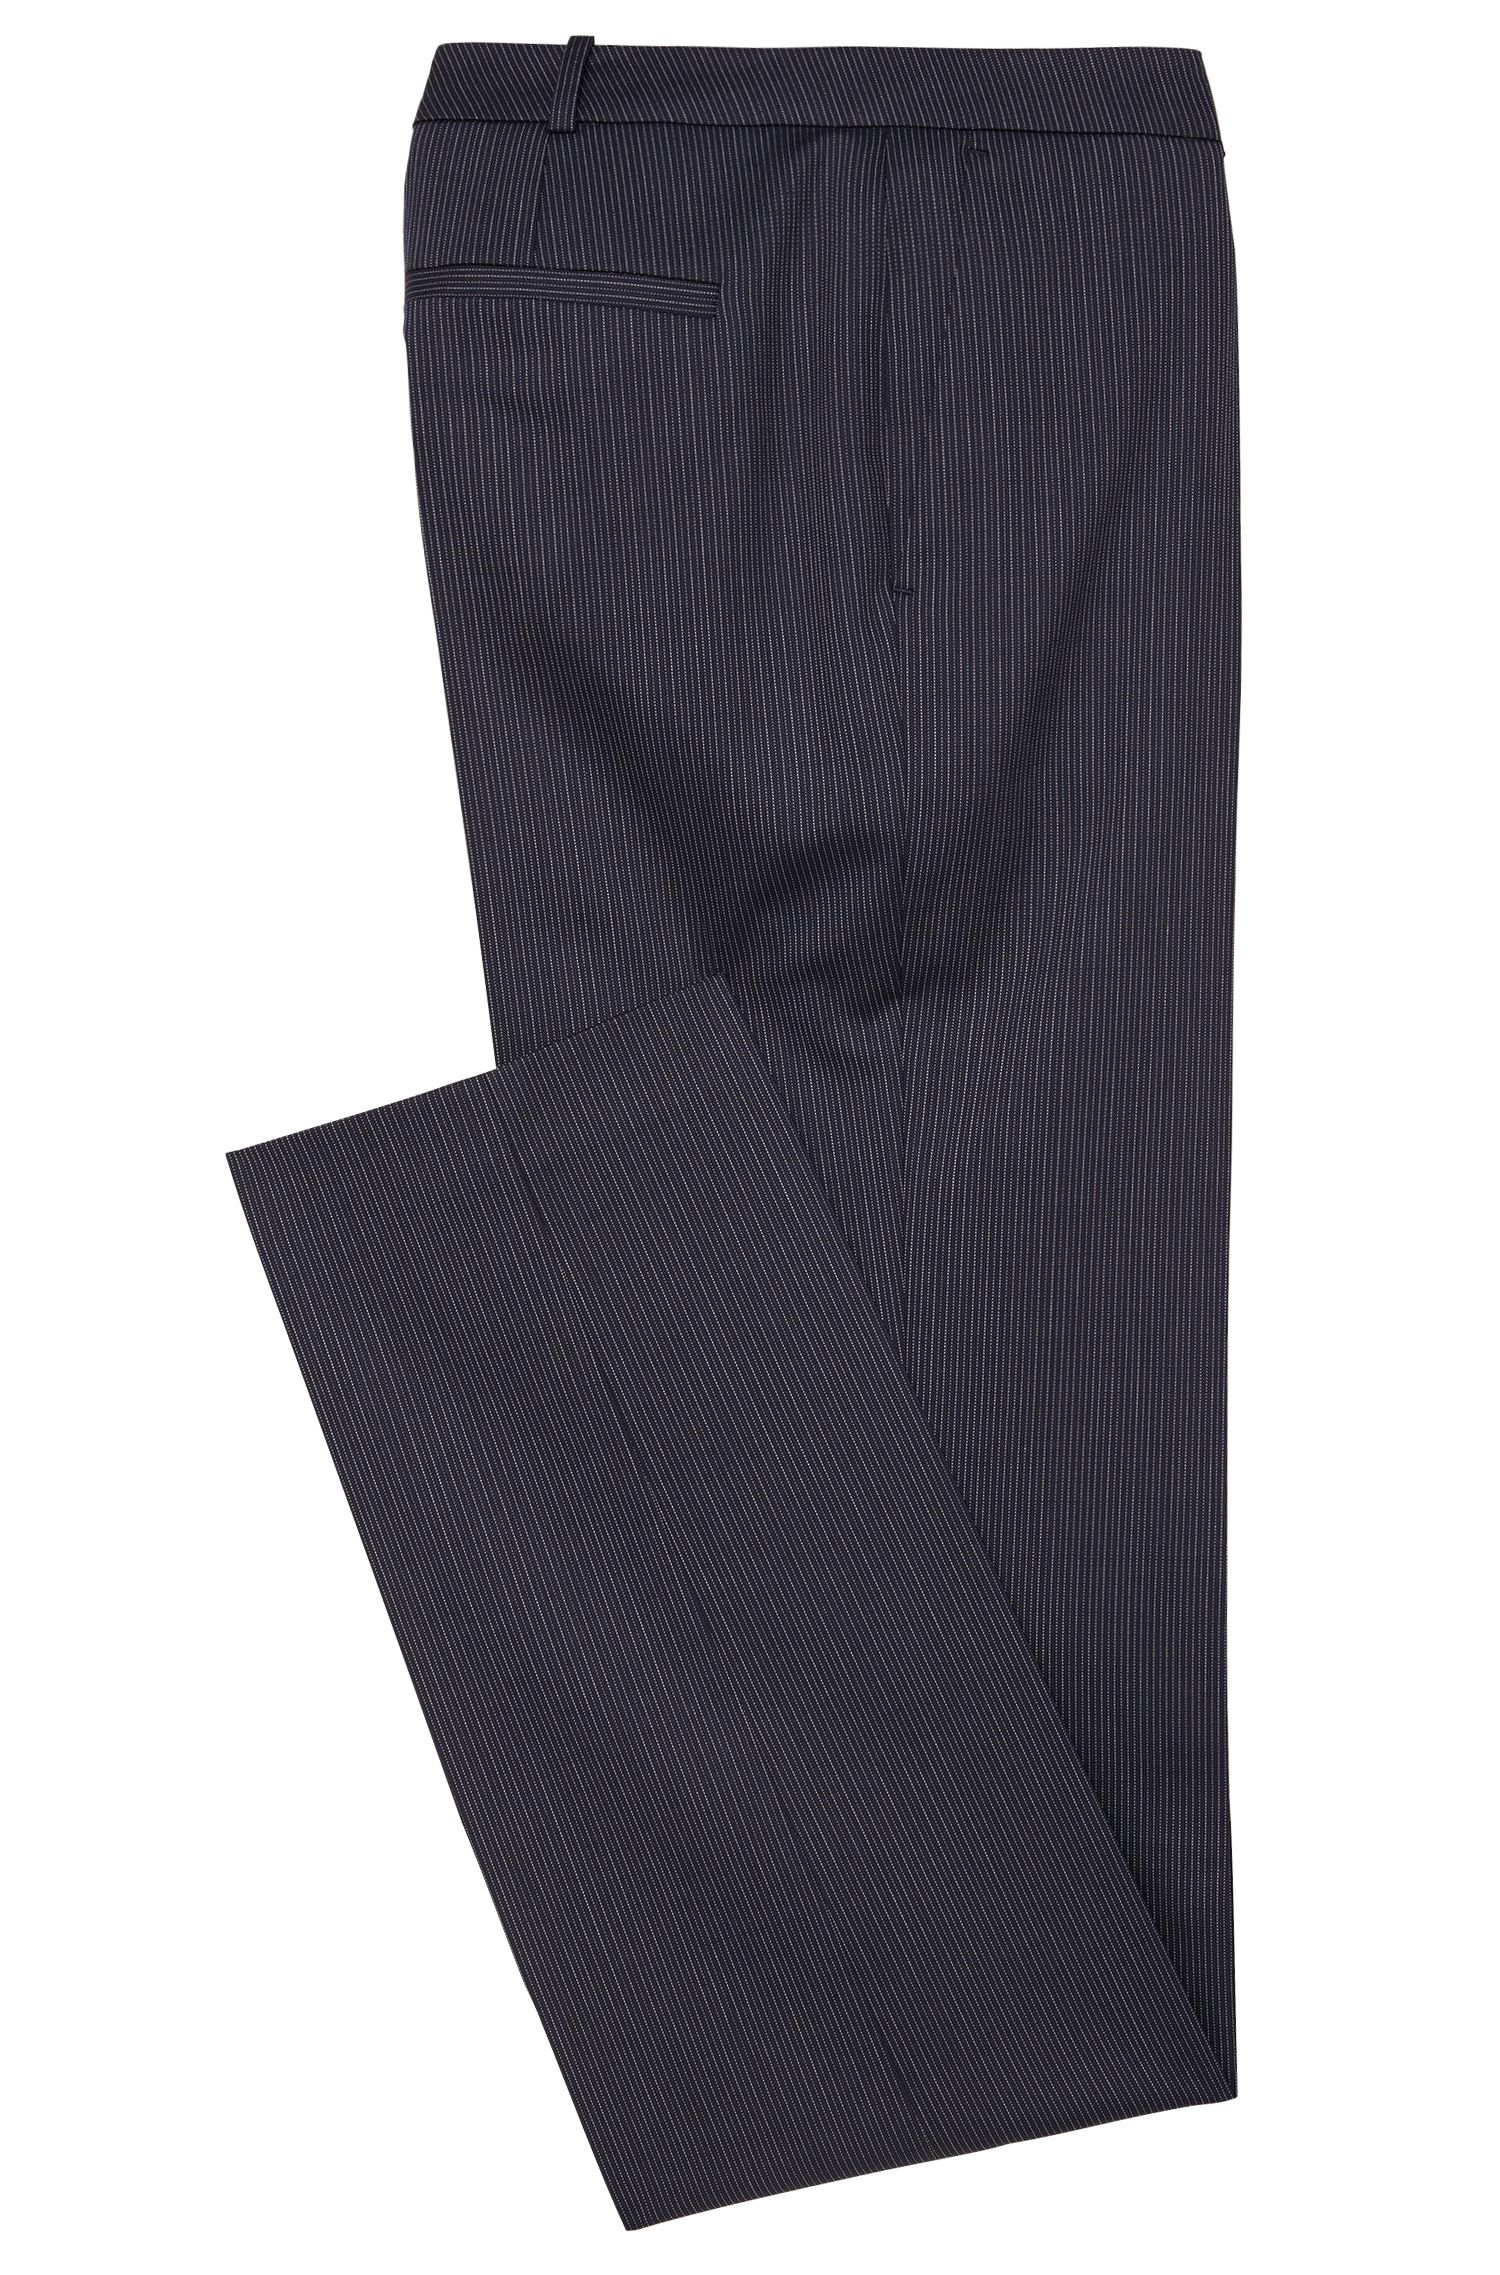 Fein gestreifte Regular-Fit Hose aus Stretch-Schurwolle: 'Tamea1'